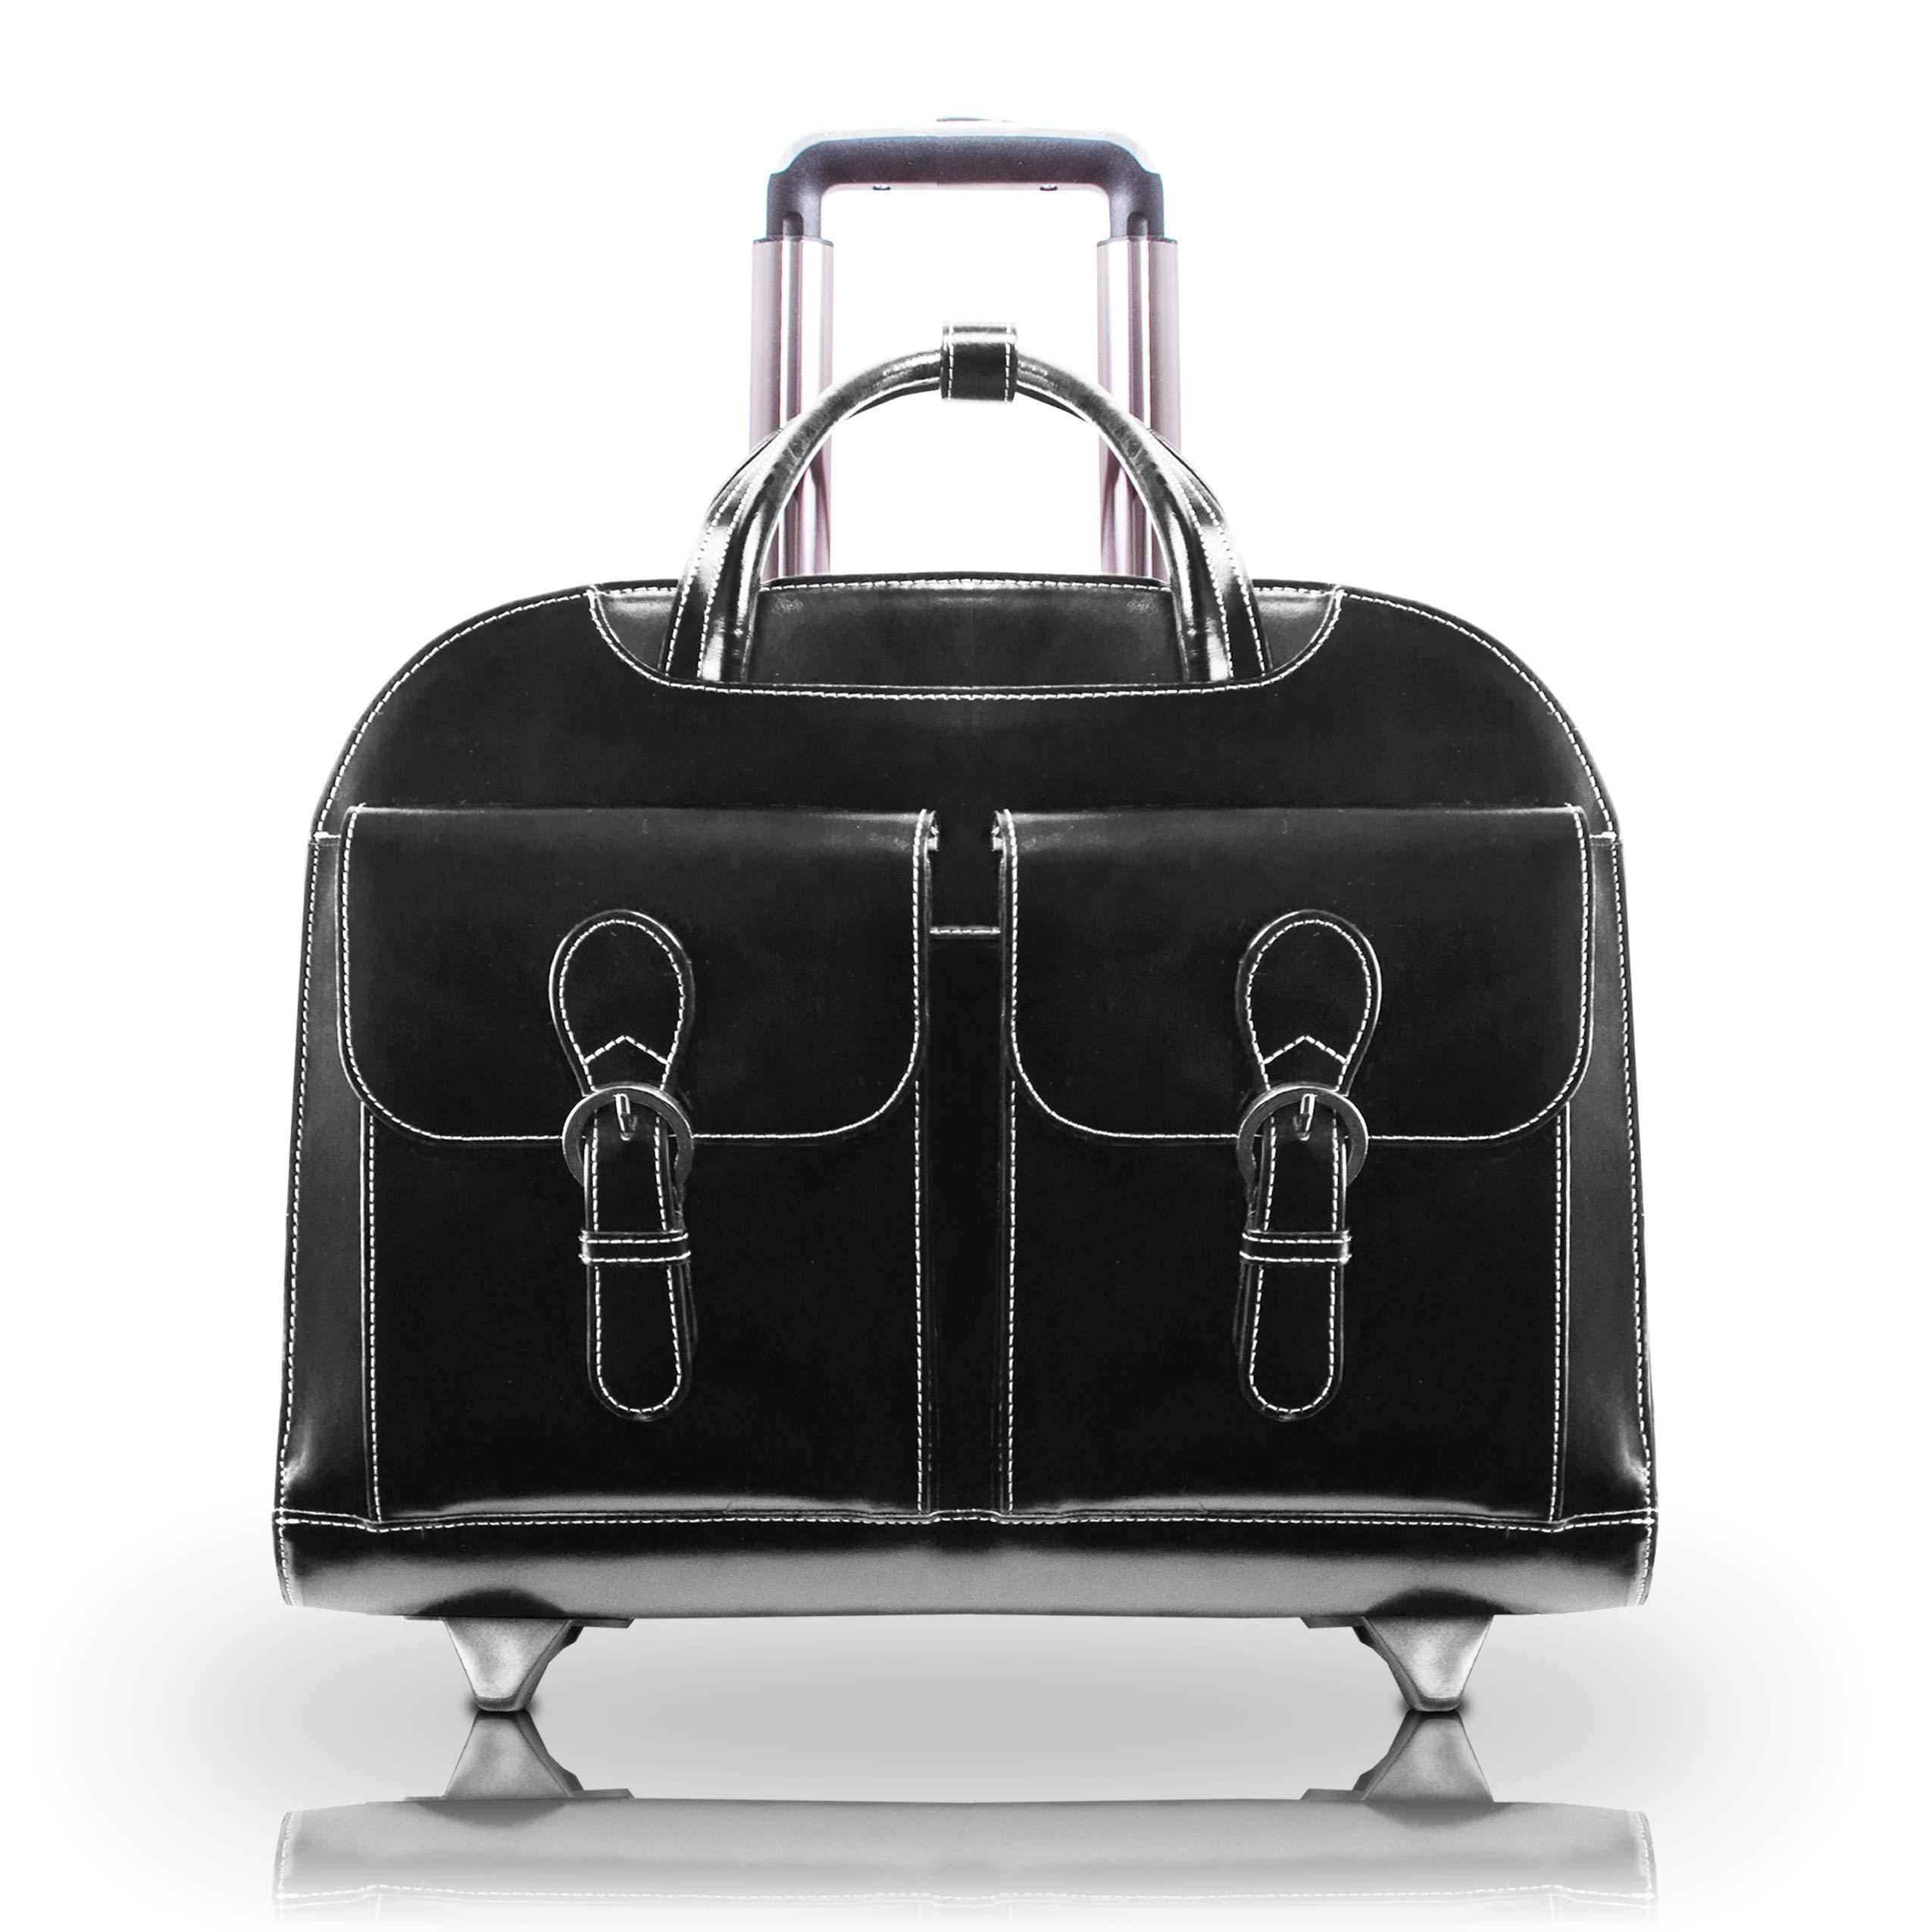 "McKlein USA Davis Leather 15.4"" Wheeled Ladies' Laptop Case"